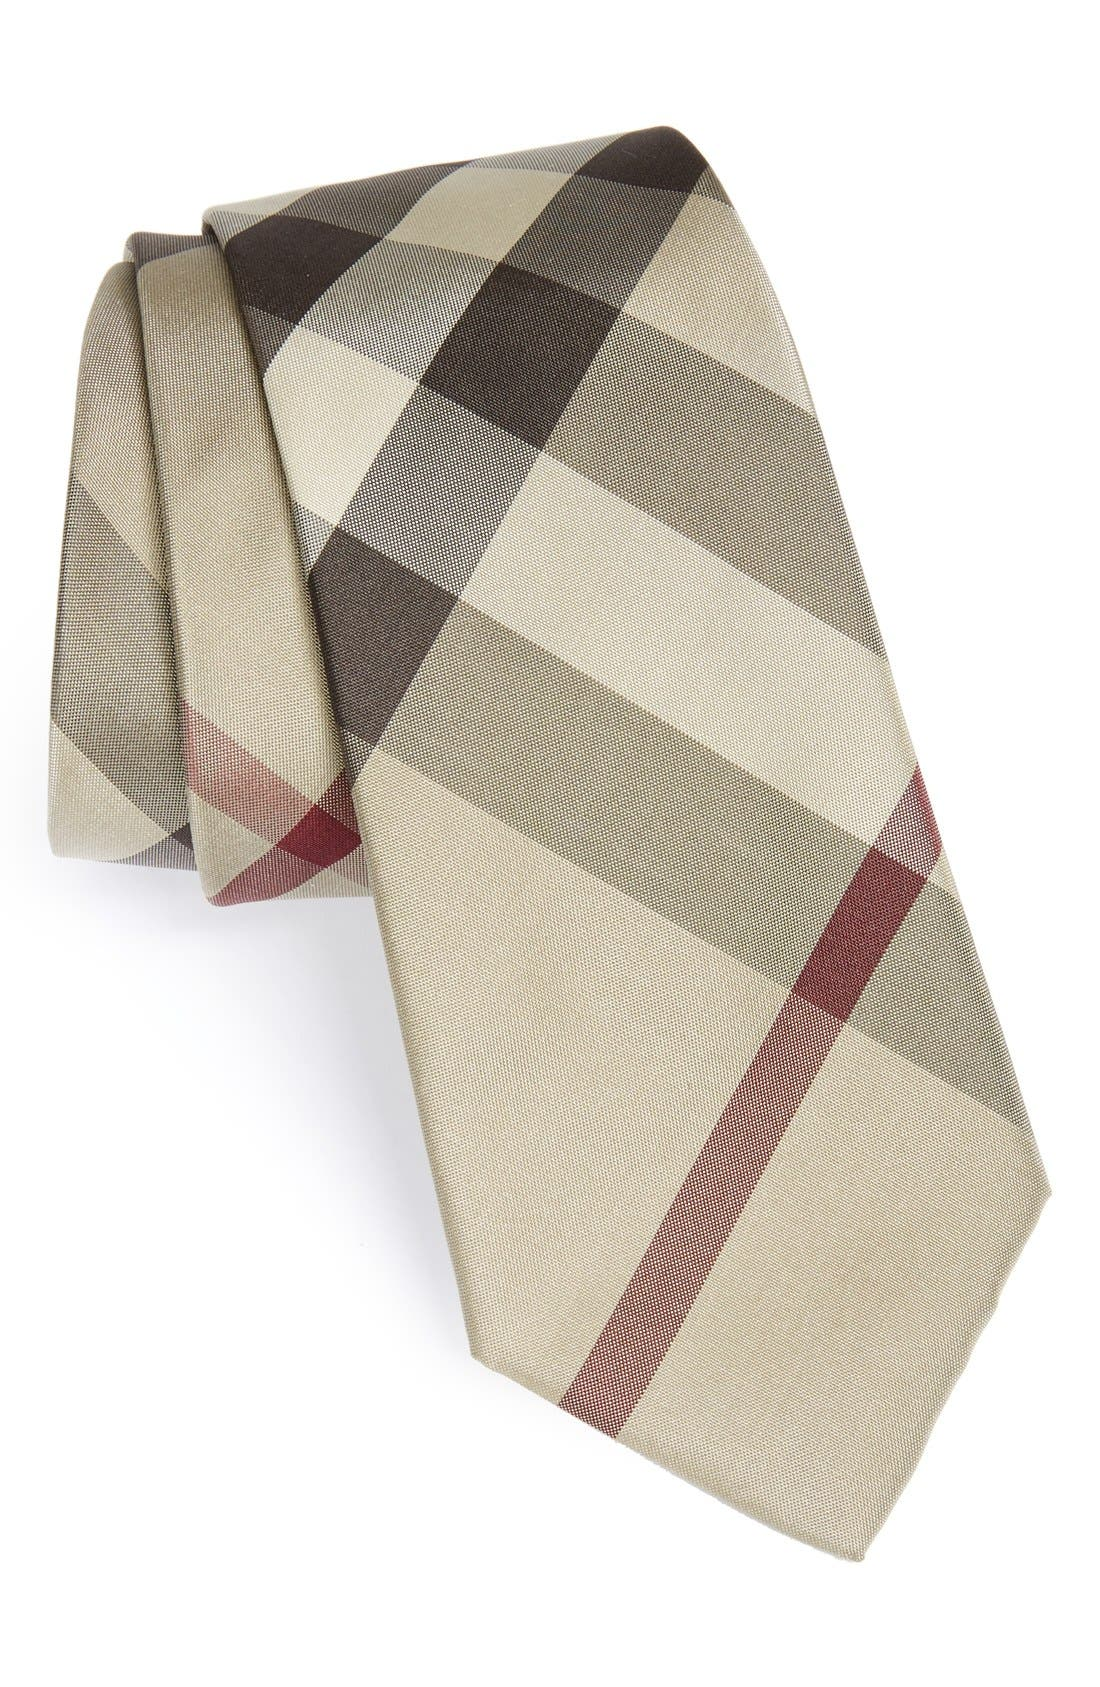 Alternate Image 1 Selected - Burberry London 'Rohan' Woven Silk Tie